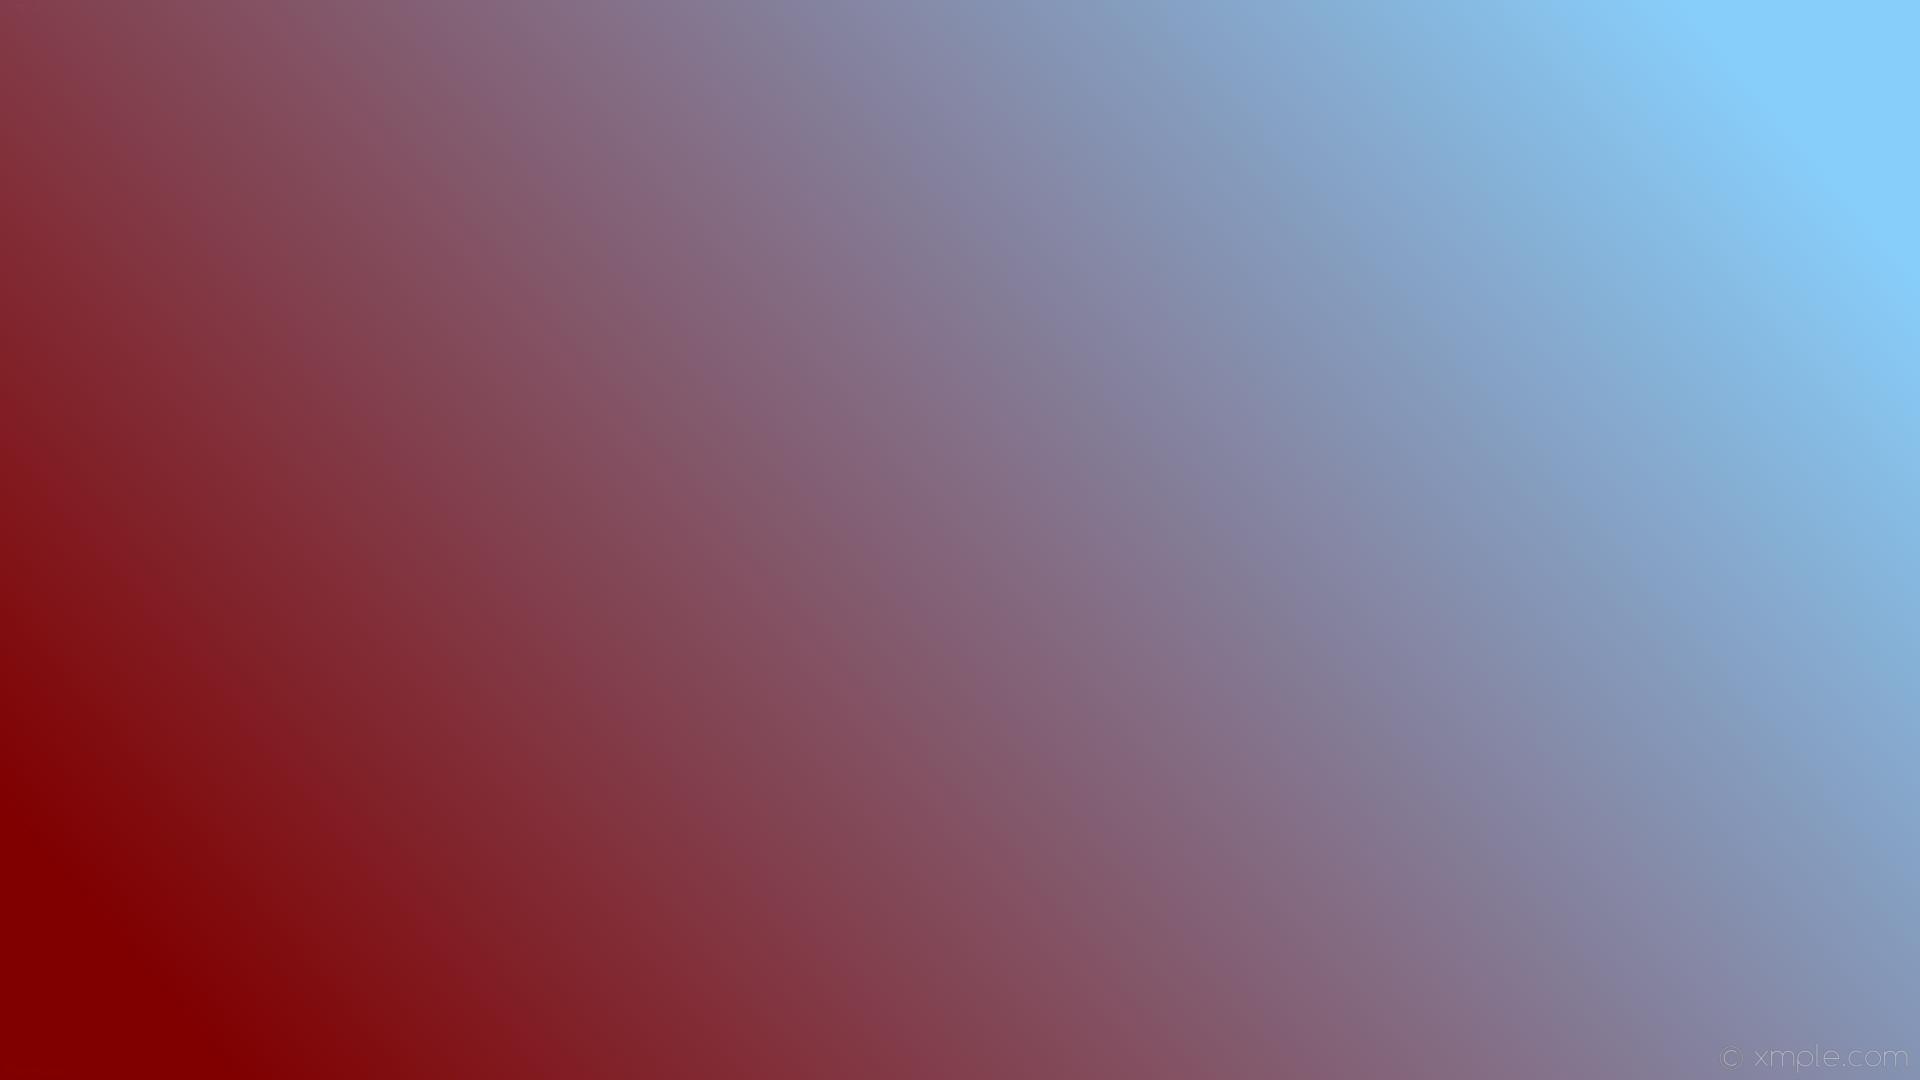 wallpaper brown blue gradient linear light sky blue maroon #87cefa #800000  15°